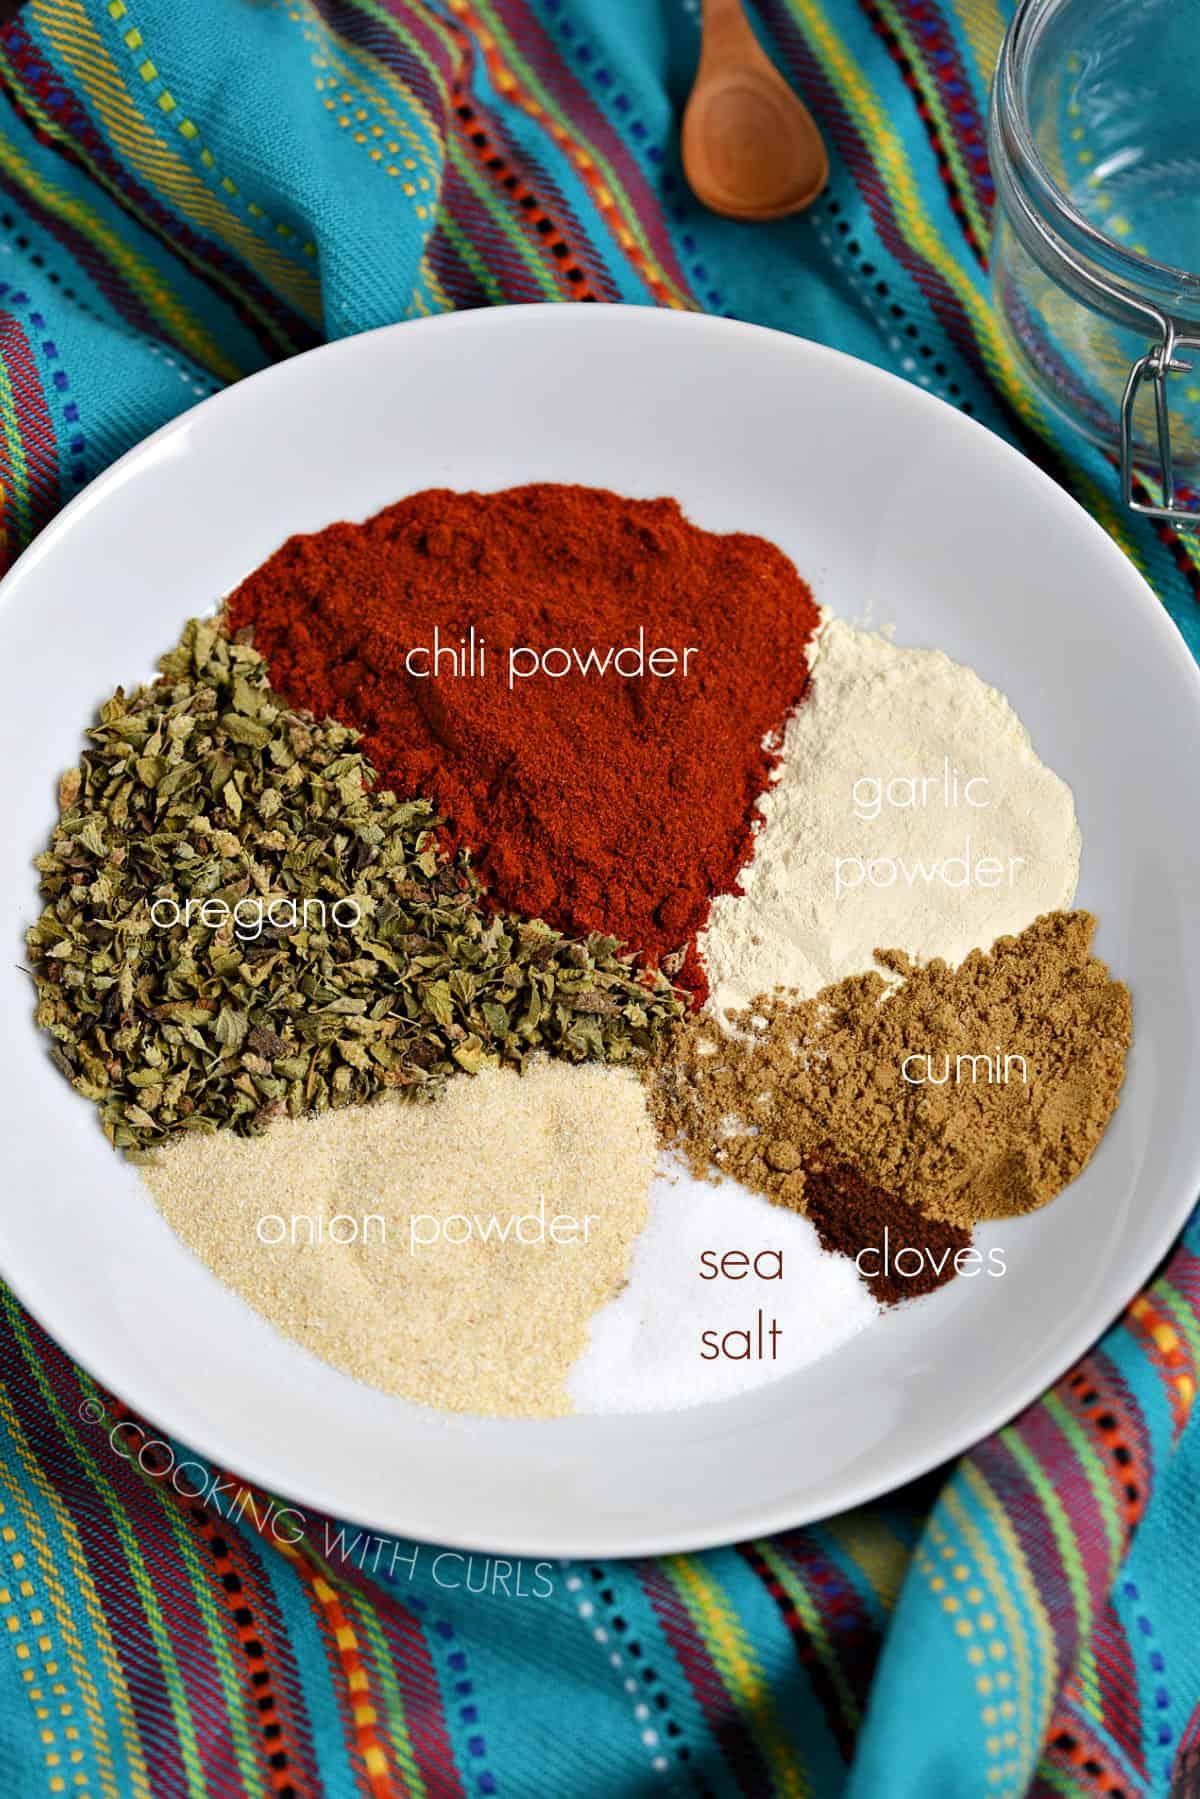 Chili powder, oregano, garlic powder, cumin, onion powder, cloves and sea salt in a white bowl.